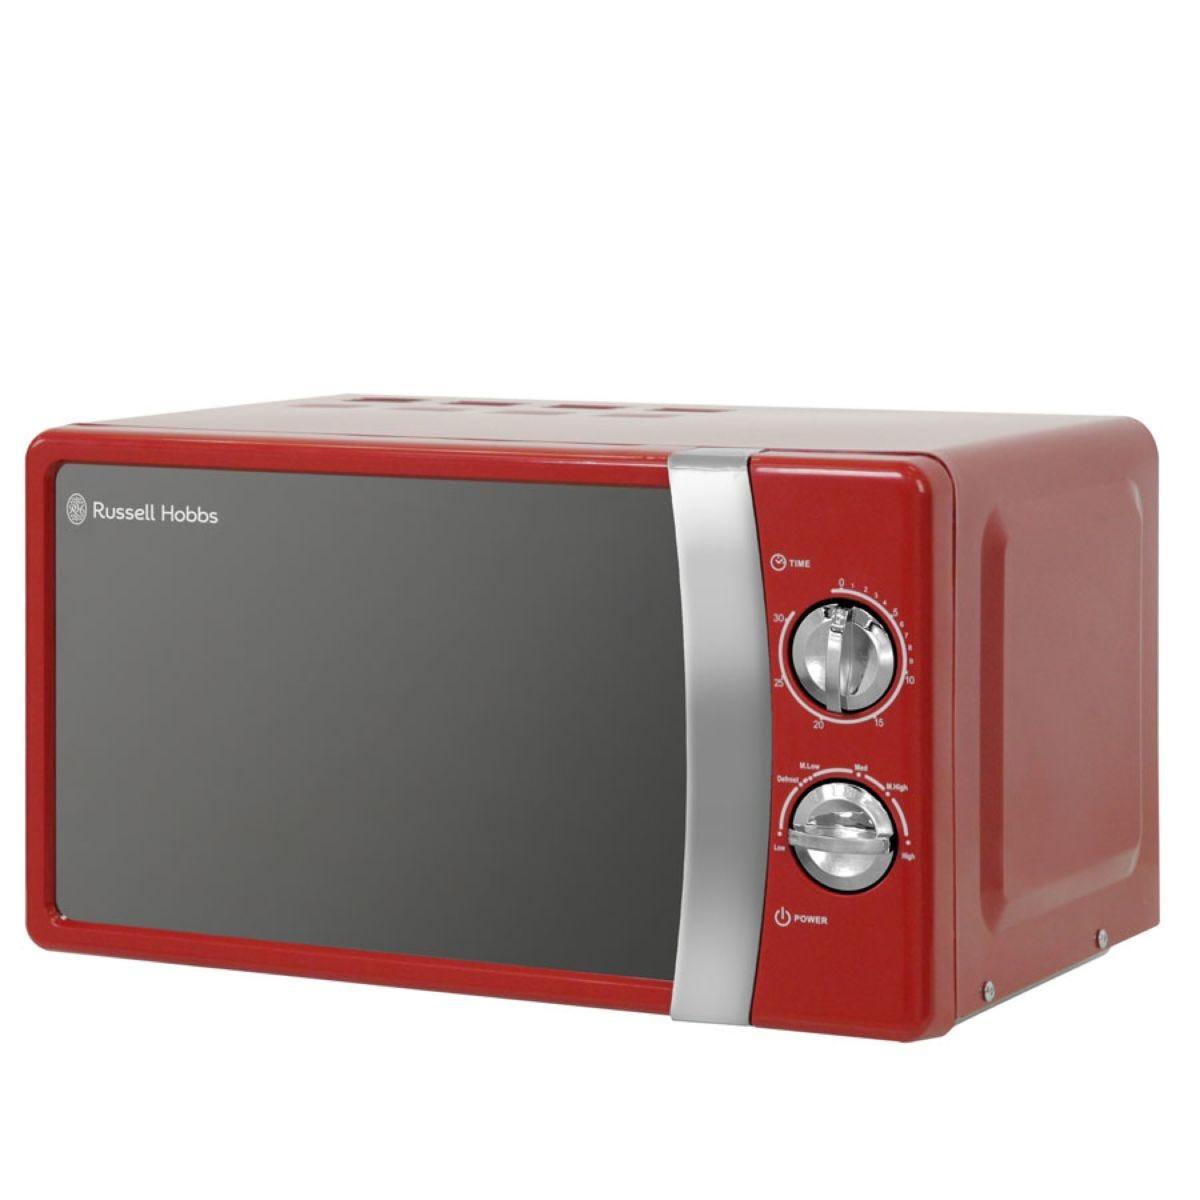 Russell Hobbs RHMM701R 700W 17L Manual Microwave -